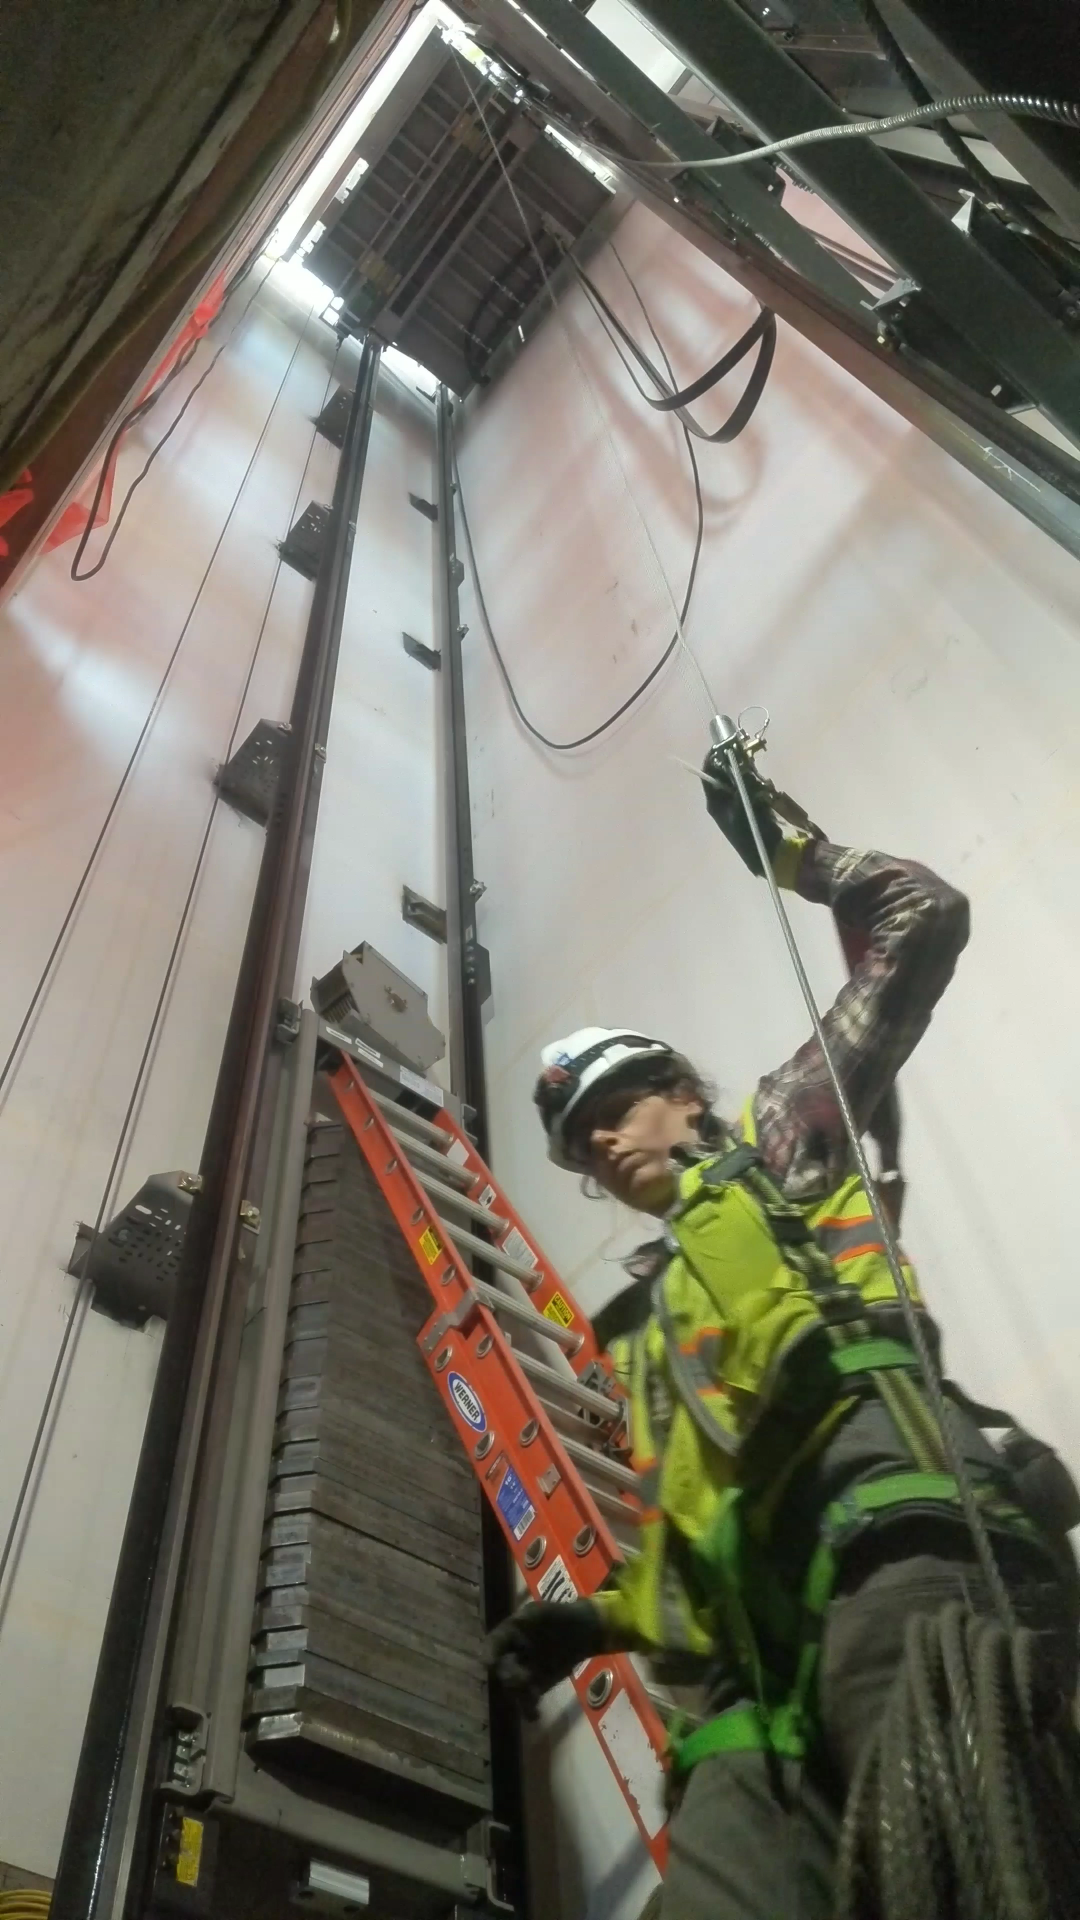 human working on elevator